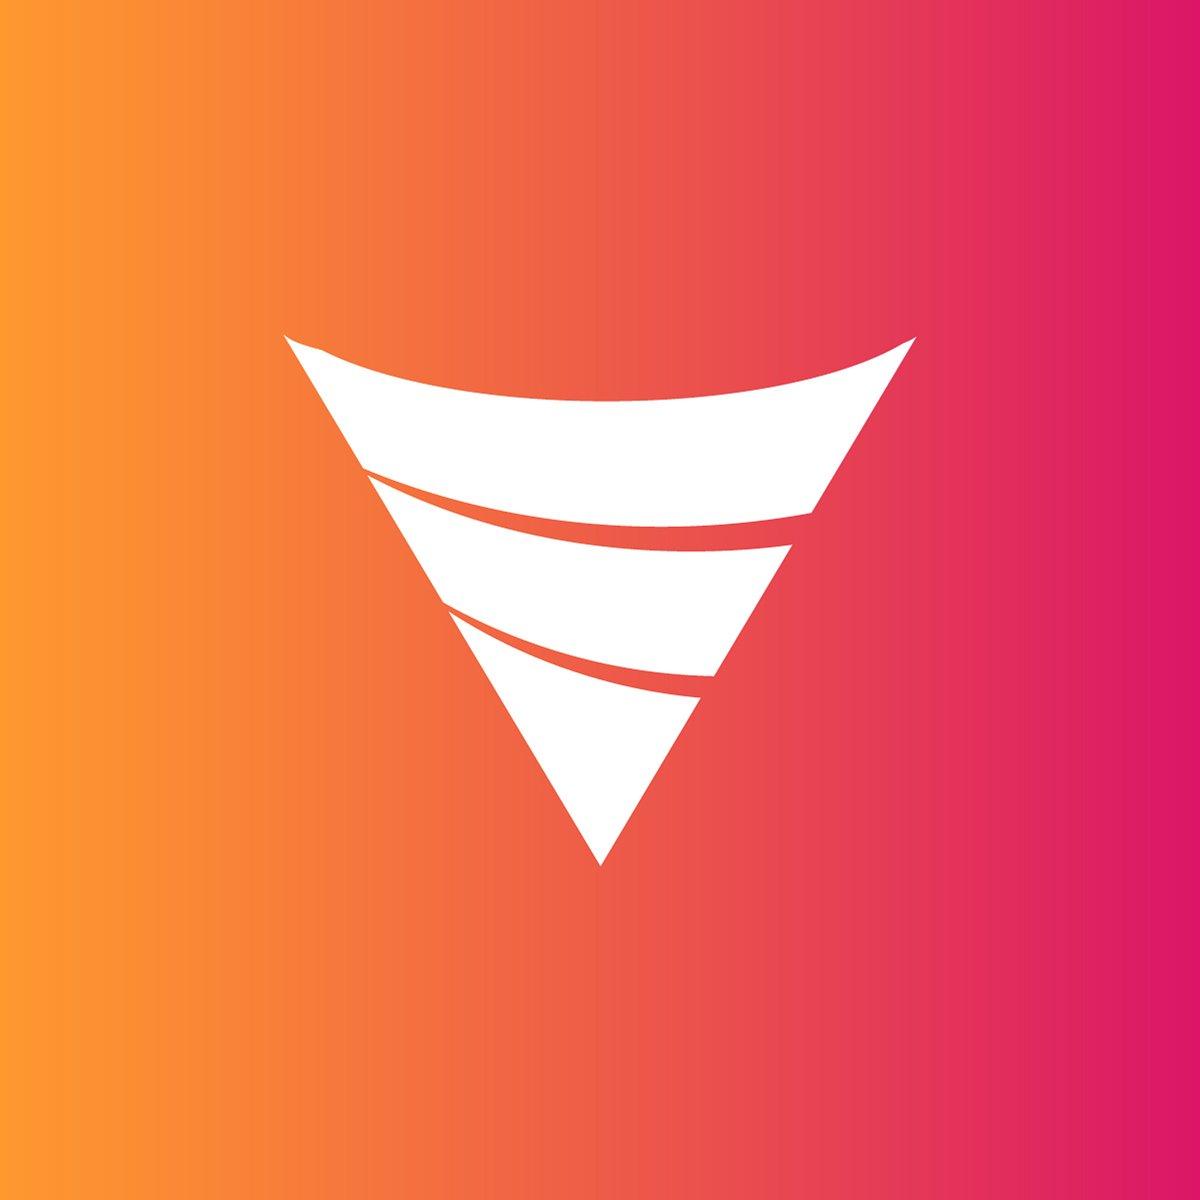 Shopify Sales Funnels app by Raid.co